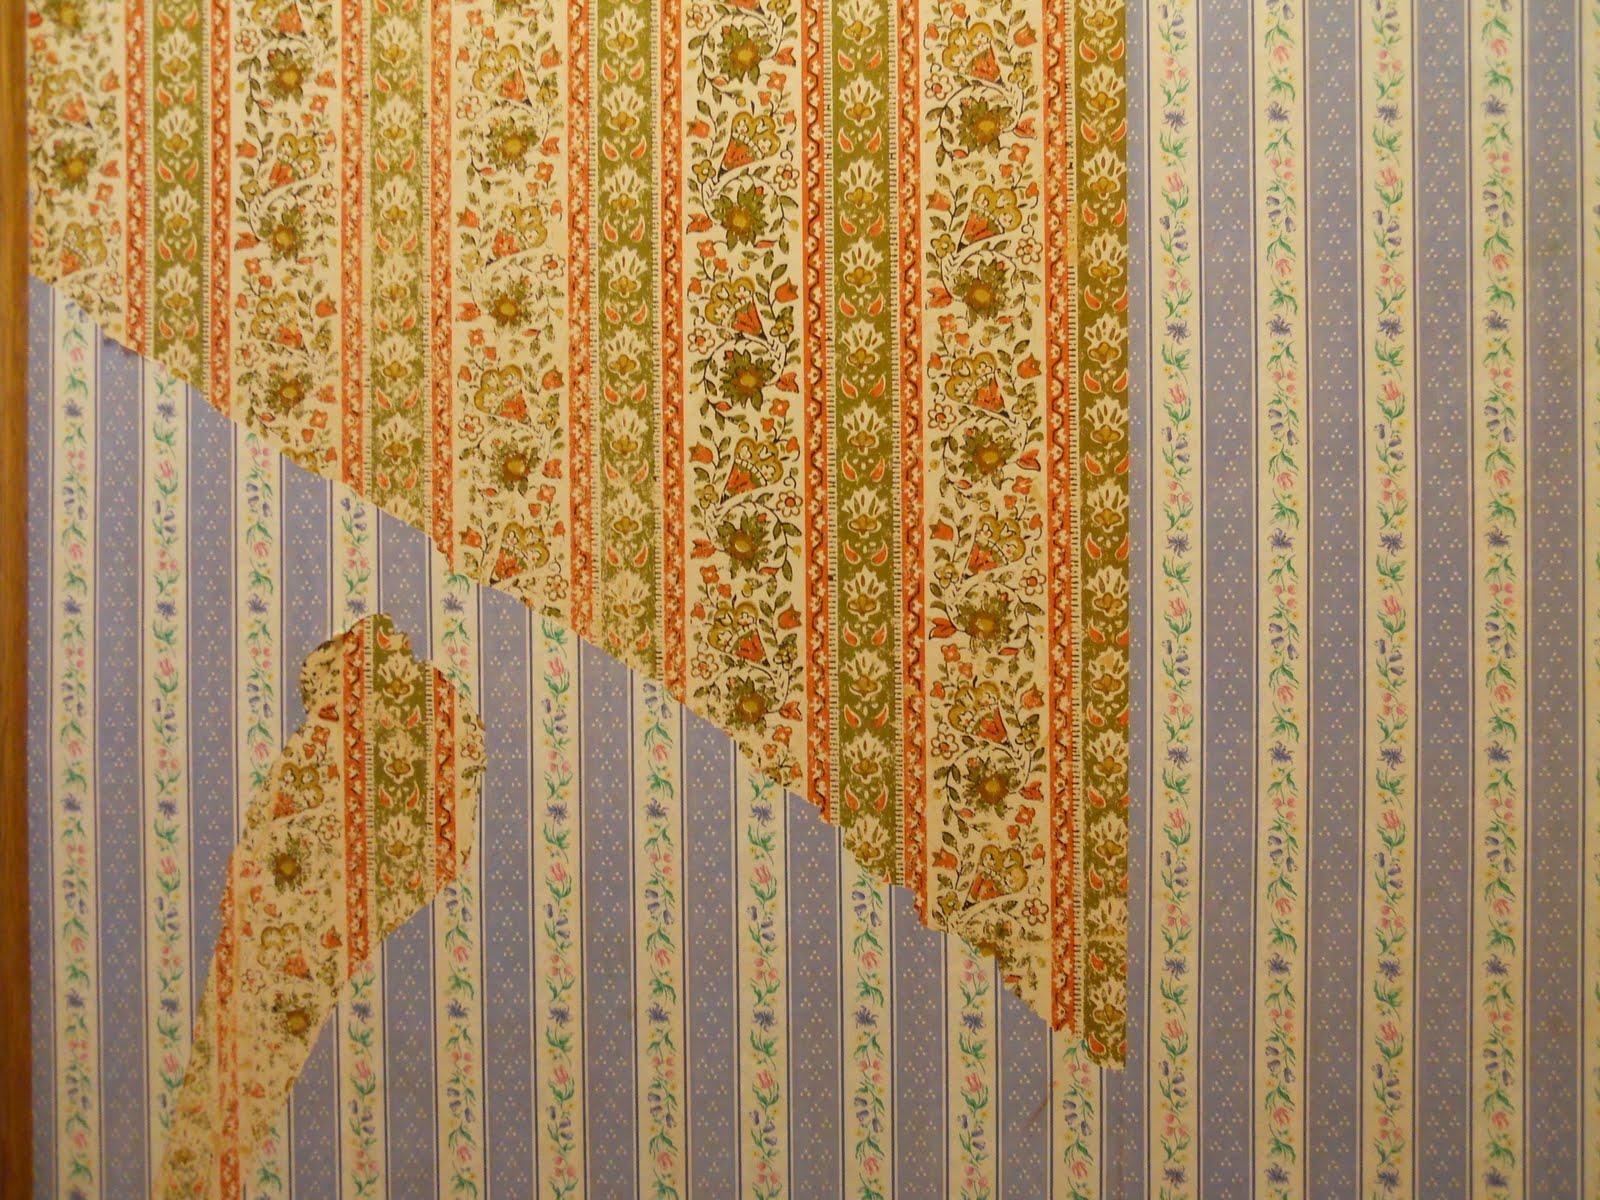 Wallpaper ugly - Ugly face wallpaper ...